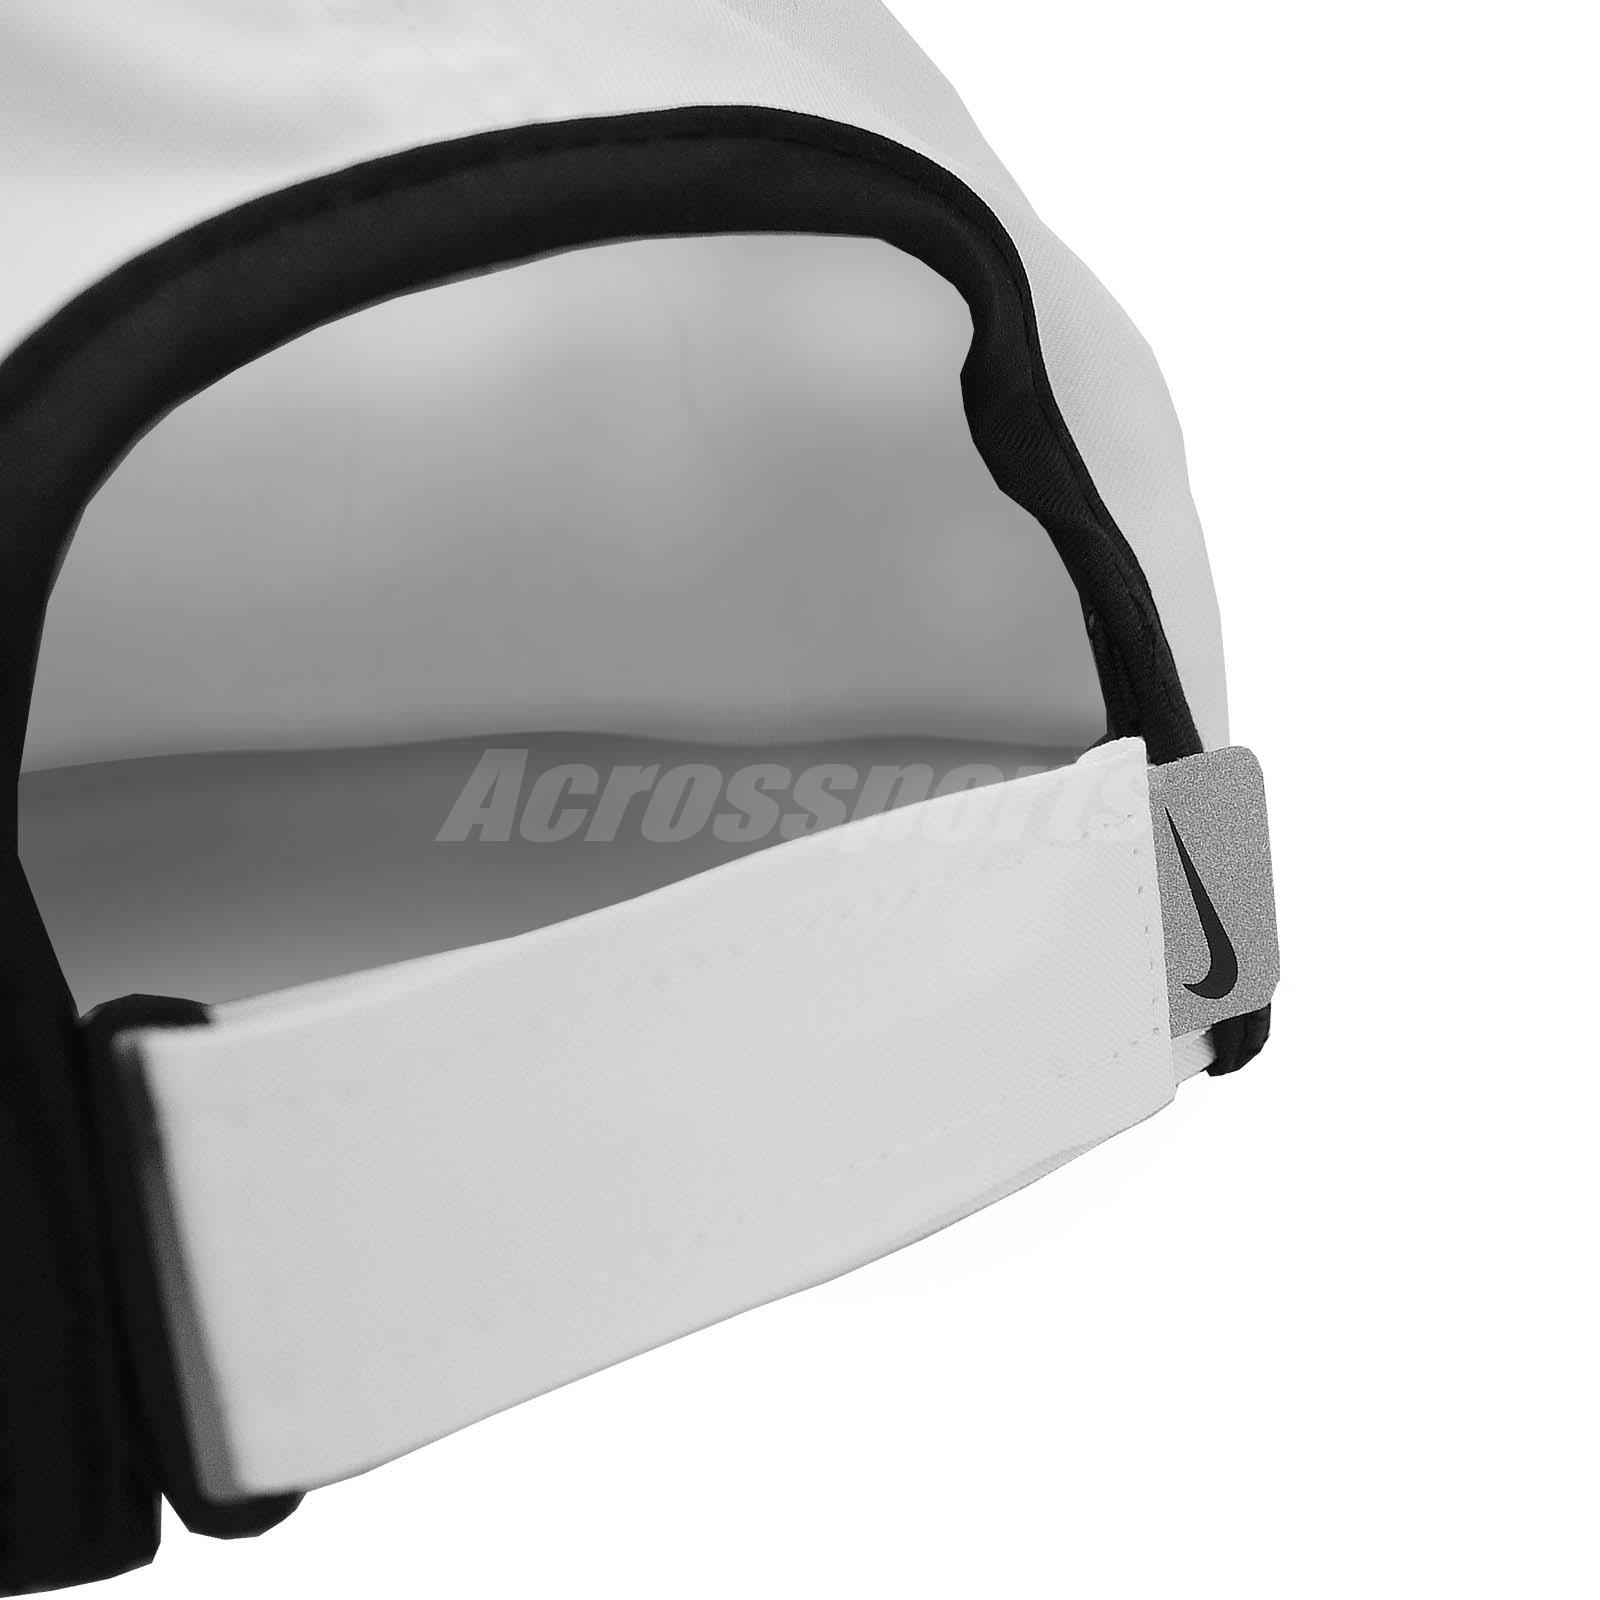 Nike Unisex Aerobill Featherlight Dri-FIT Tennis Cap Gym White Black ... 333b7fdbc7e6